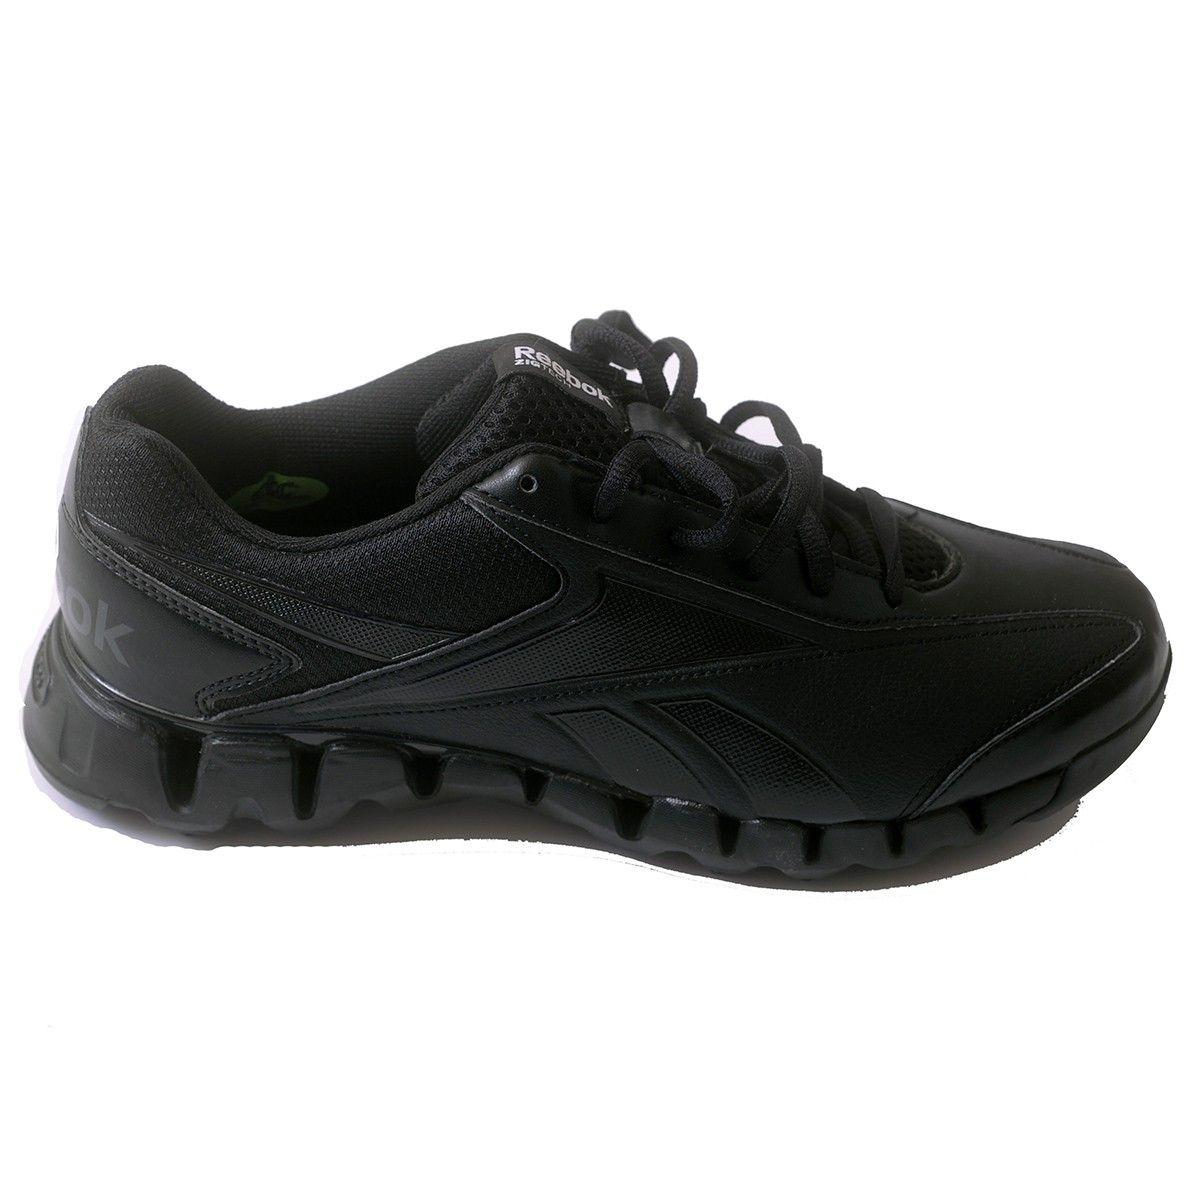 aafaa1e3bb4 Reebok zig all black umpire shoes hotel le moulin neuf jpg 1200x1200 Spot  bilt turf shoes